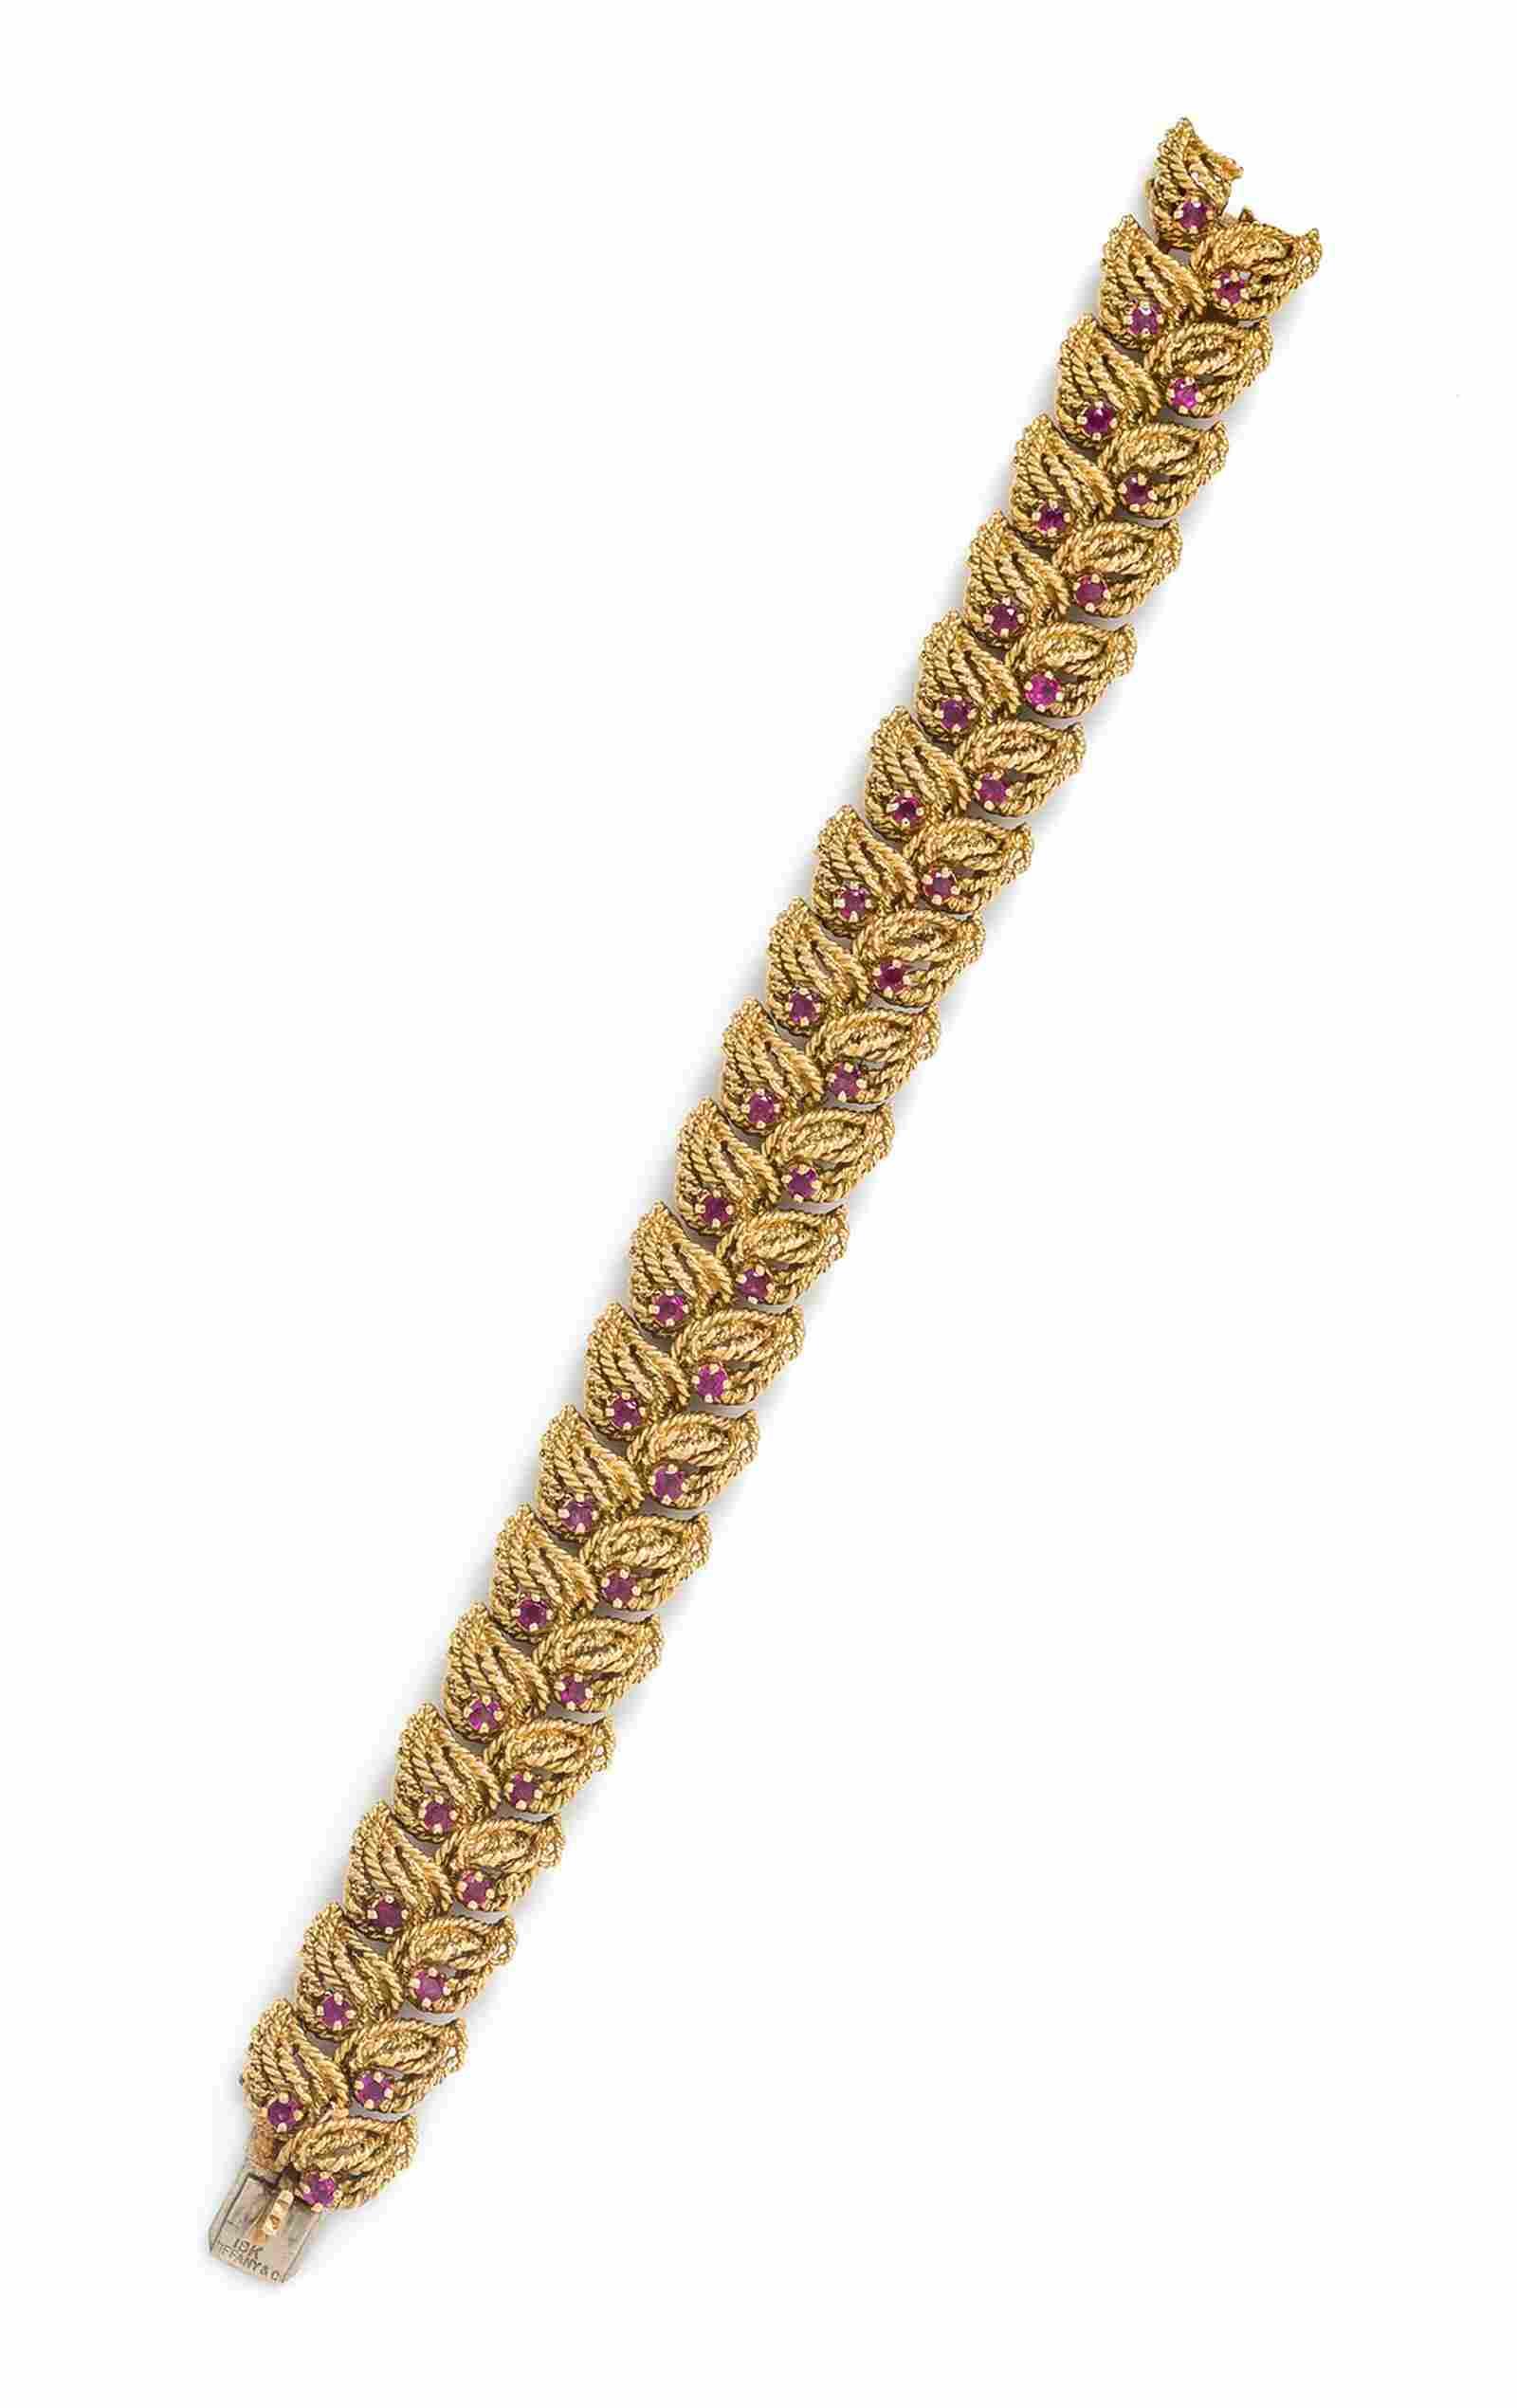 An 18 Karat Yellow Gold and Ruby Bracelet, Tiffany &